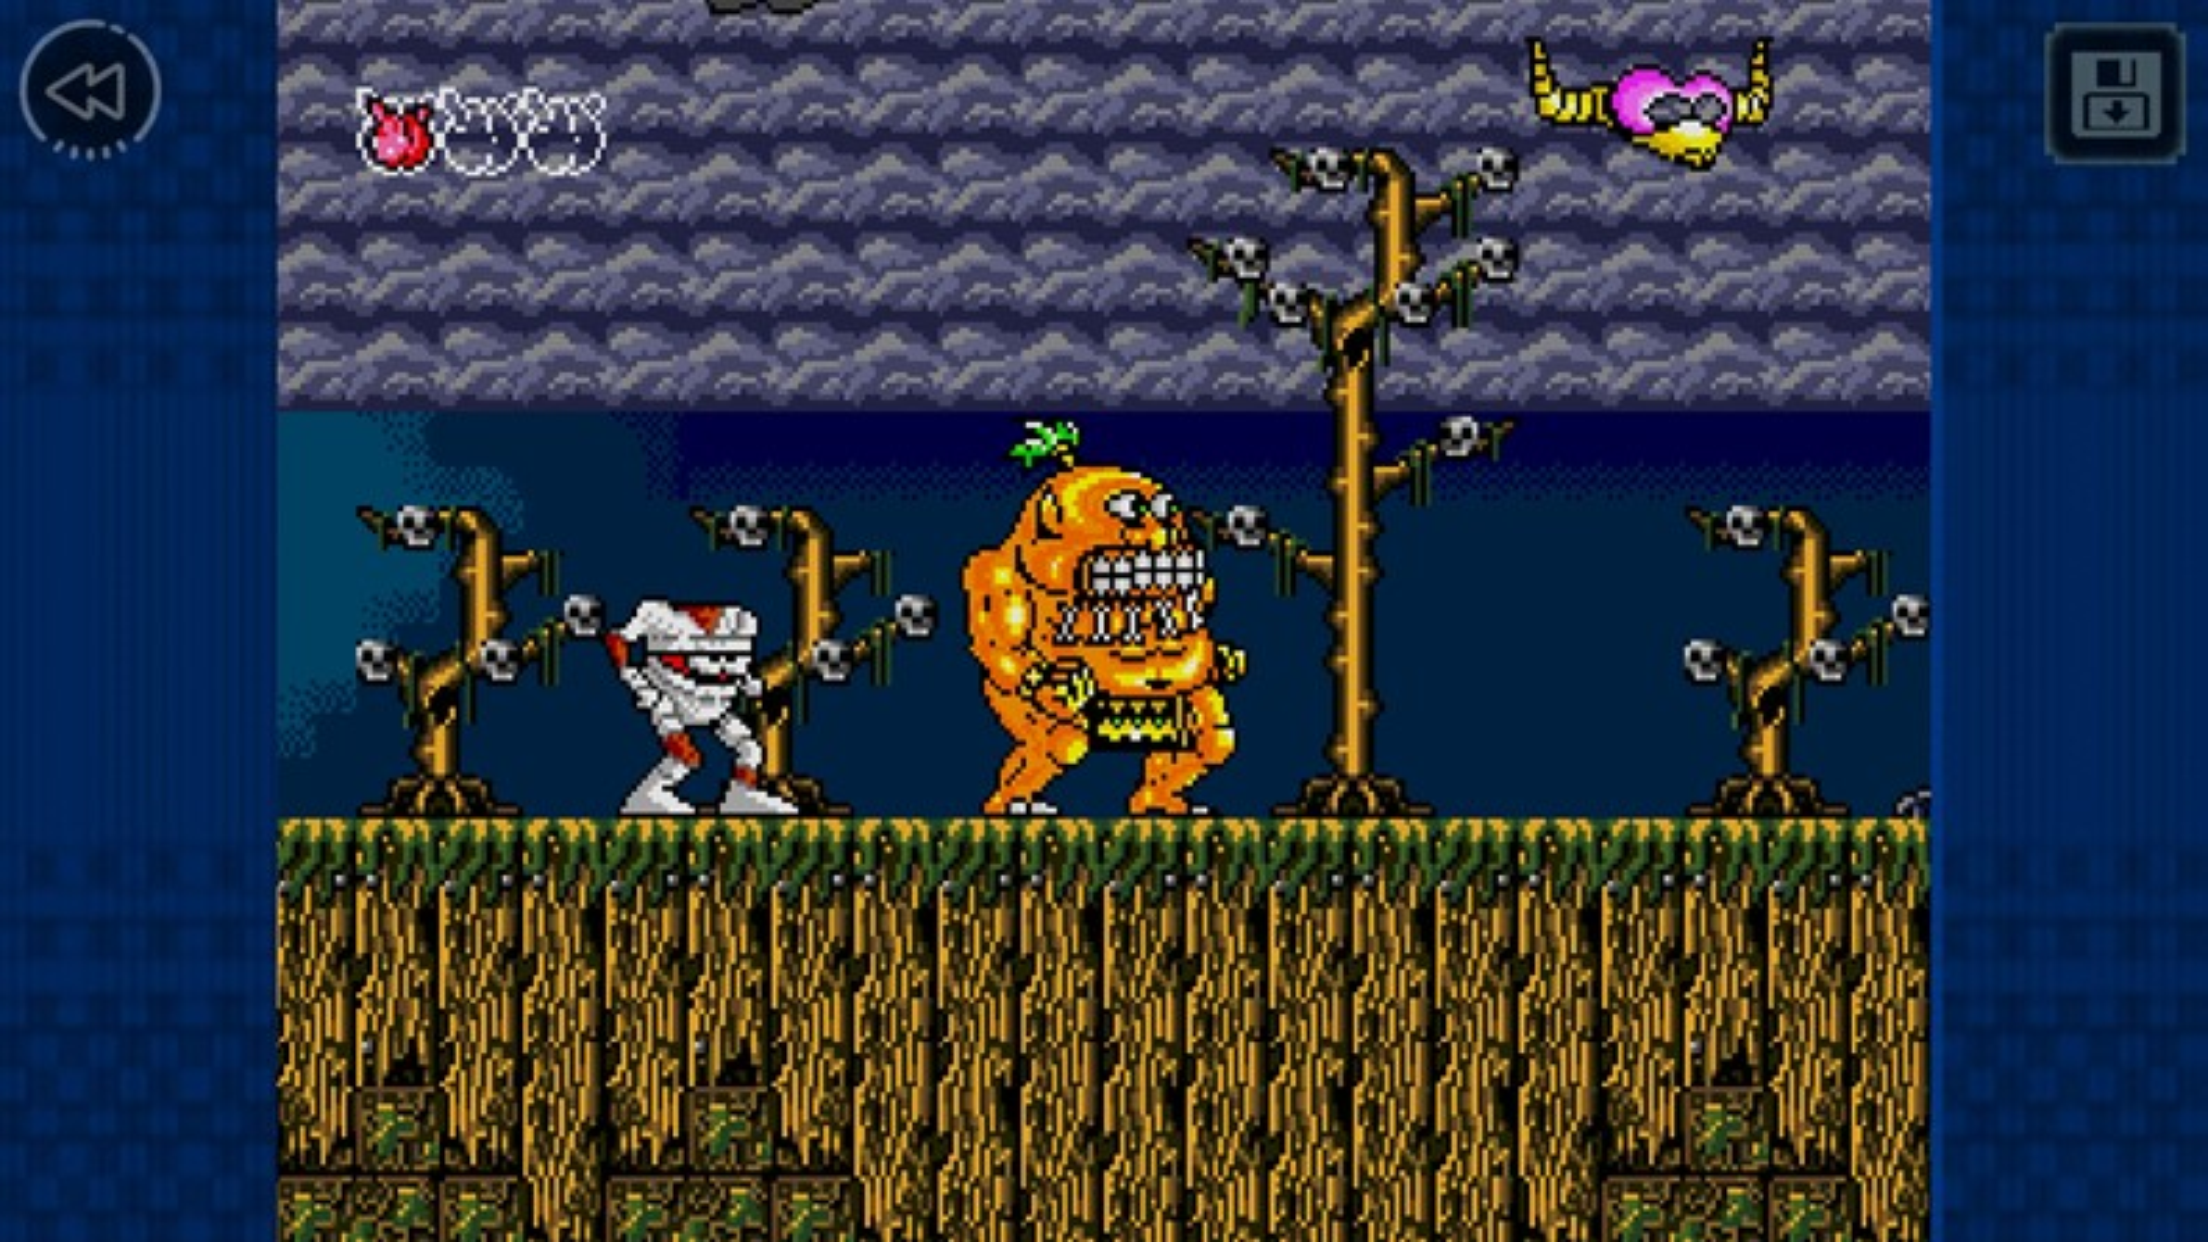 Decap Attack, jogo de Mega Drive, chega ao SEGA Forever para iOS e Android